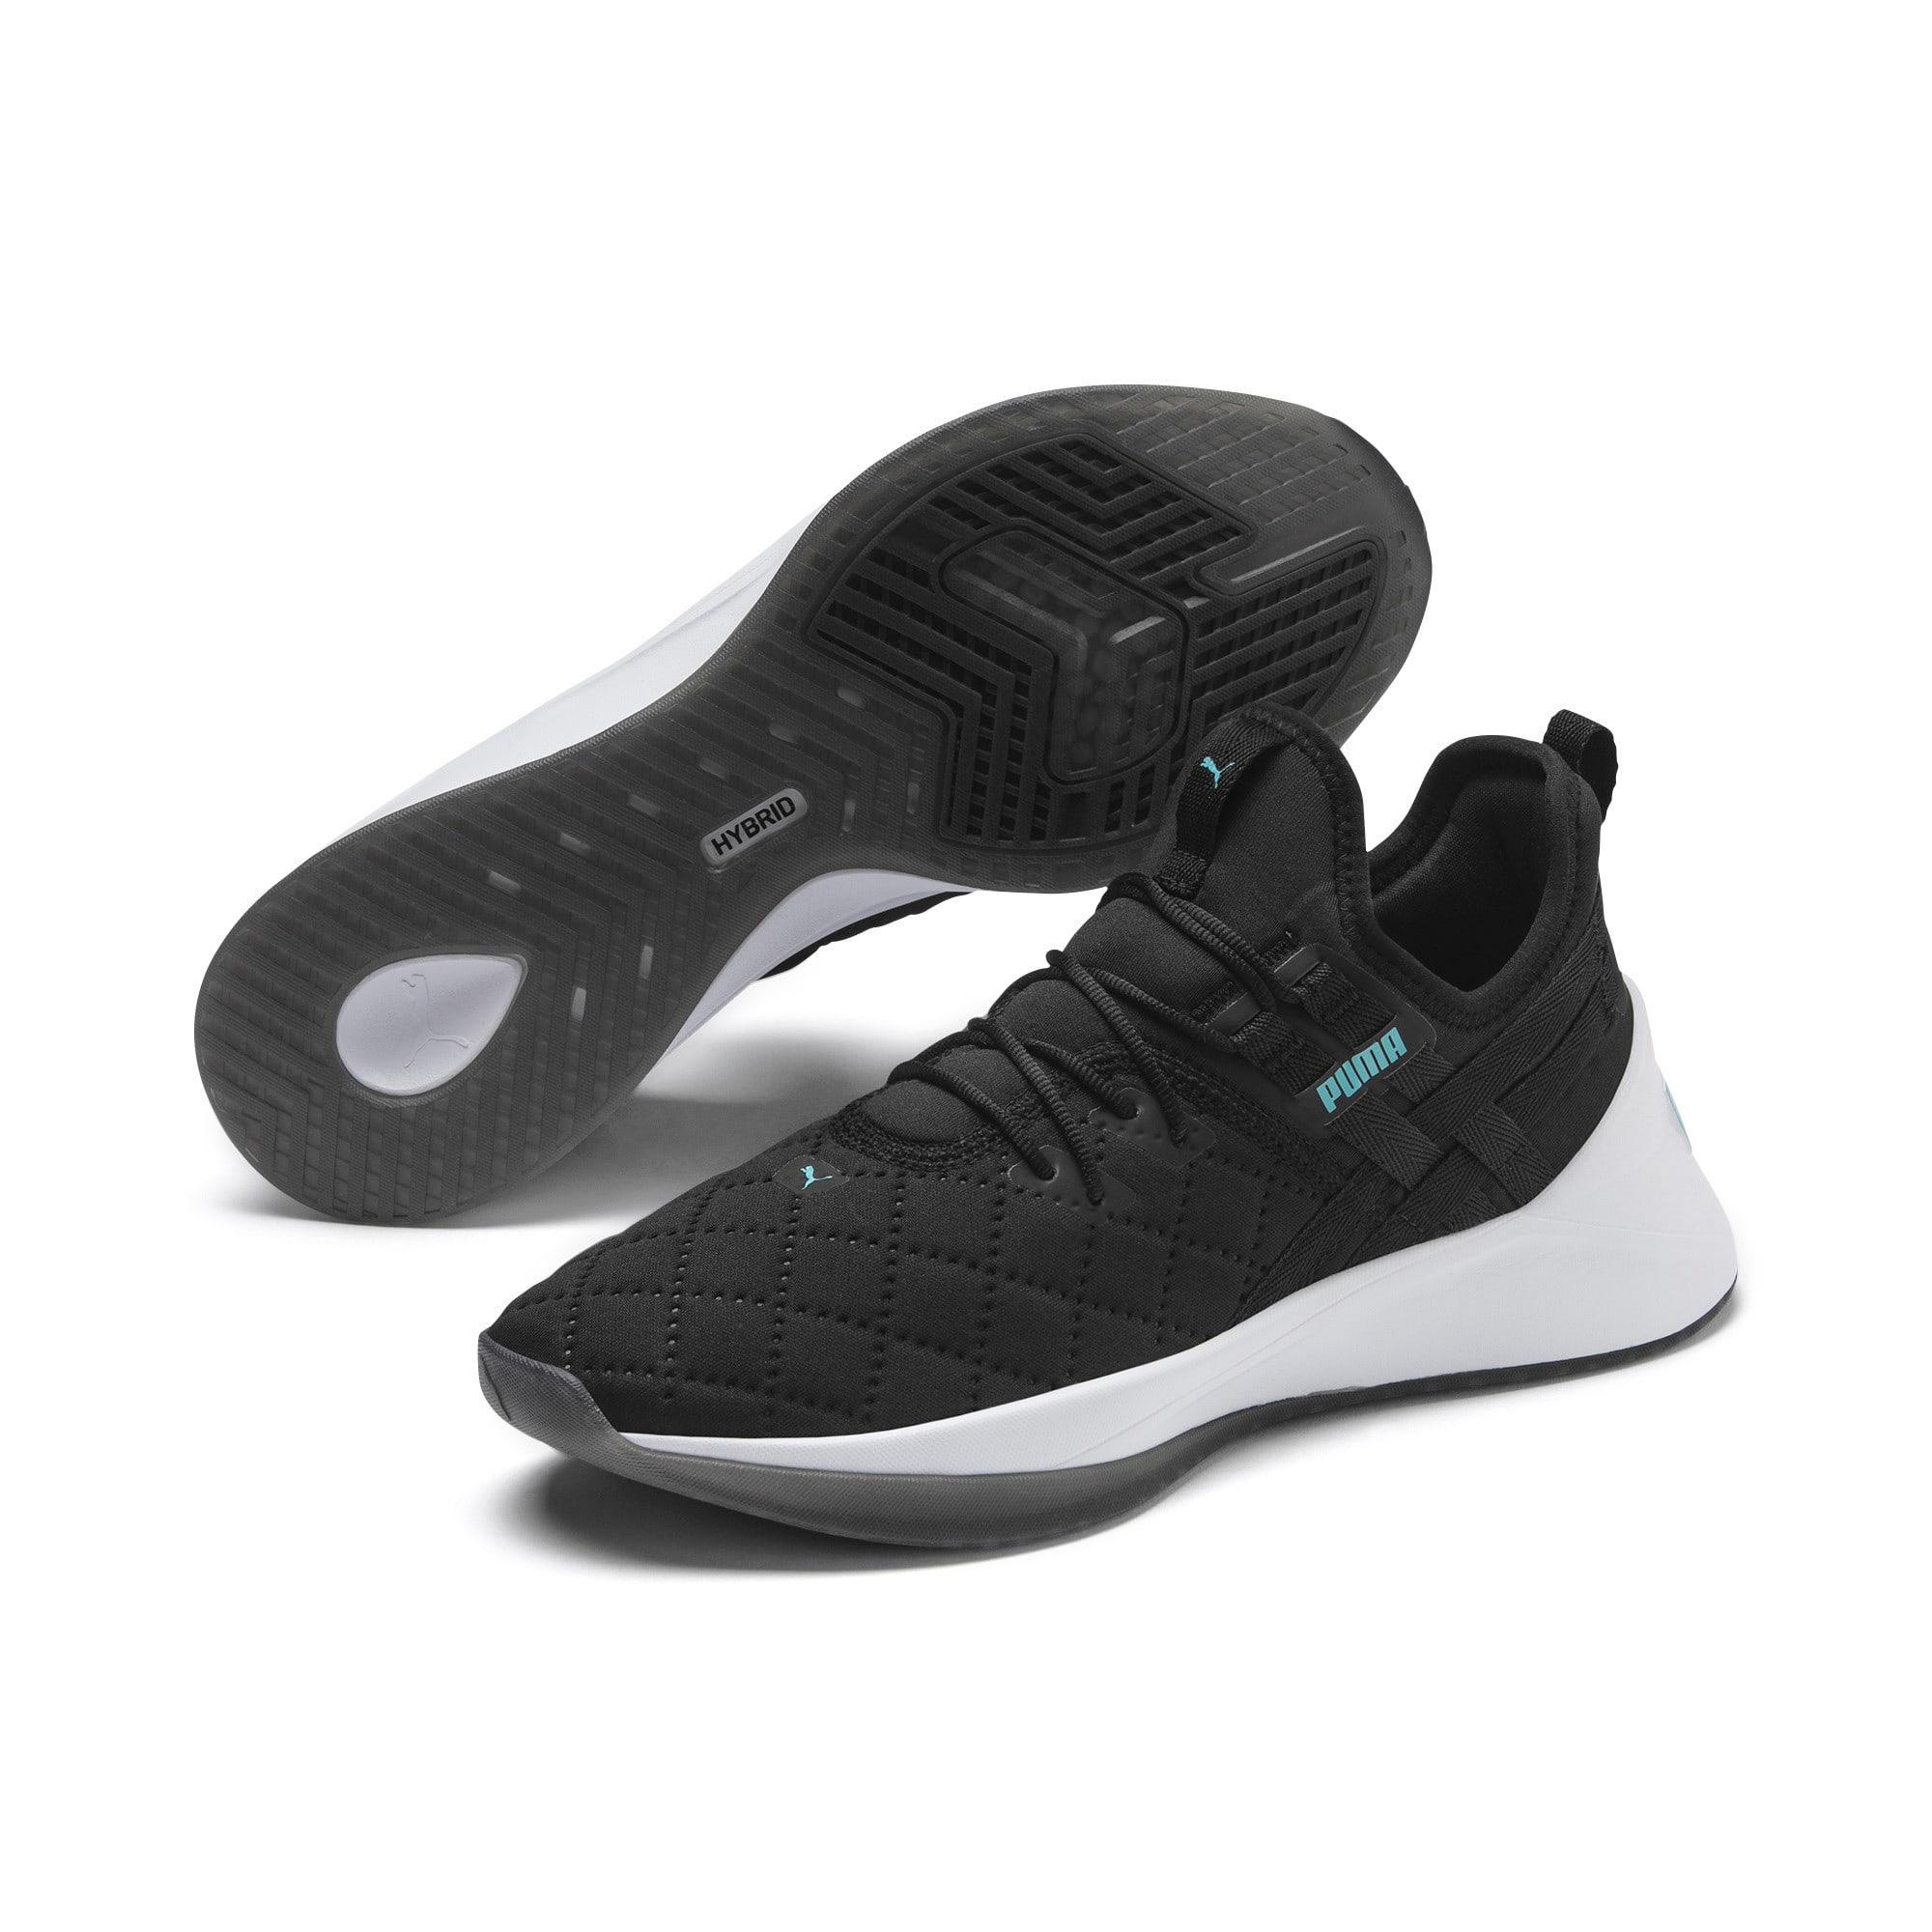 Thumbnail 2 of Jaab XT Quilt Women's Training Shoes, Puma Black-Puma White, medium